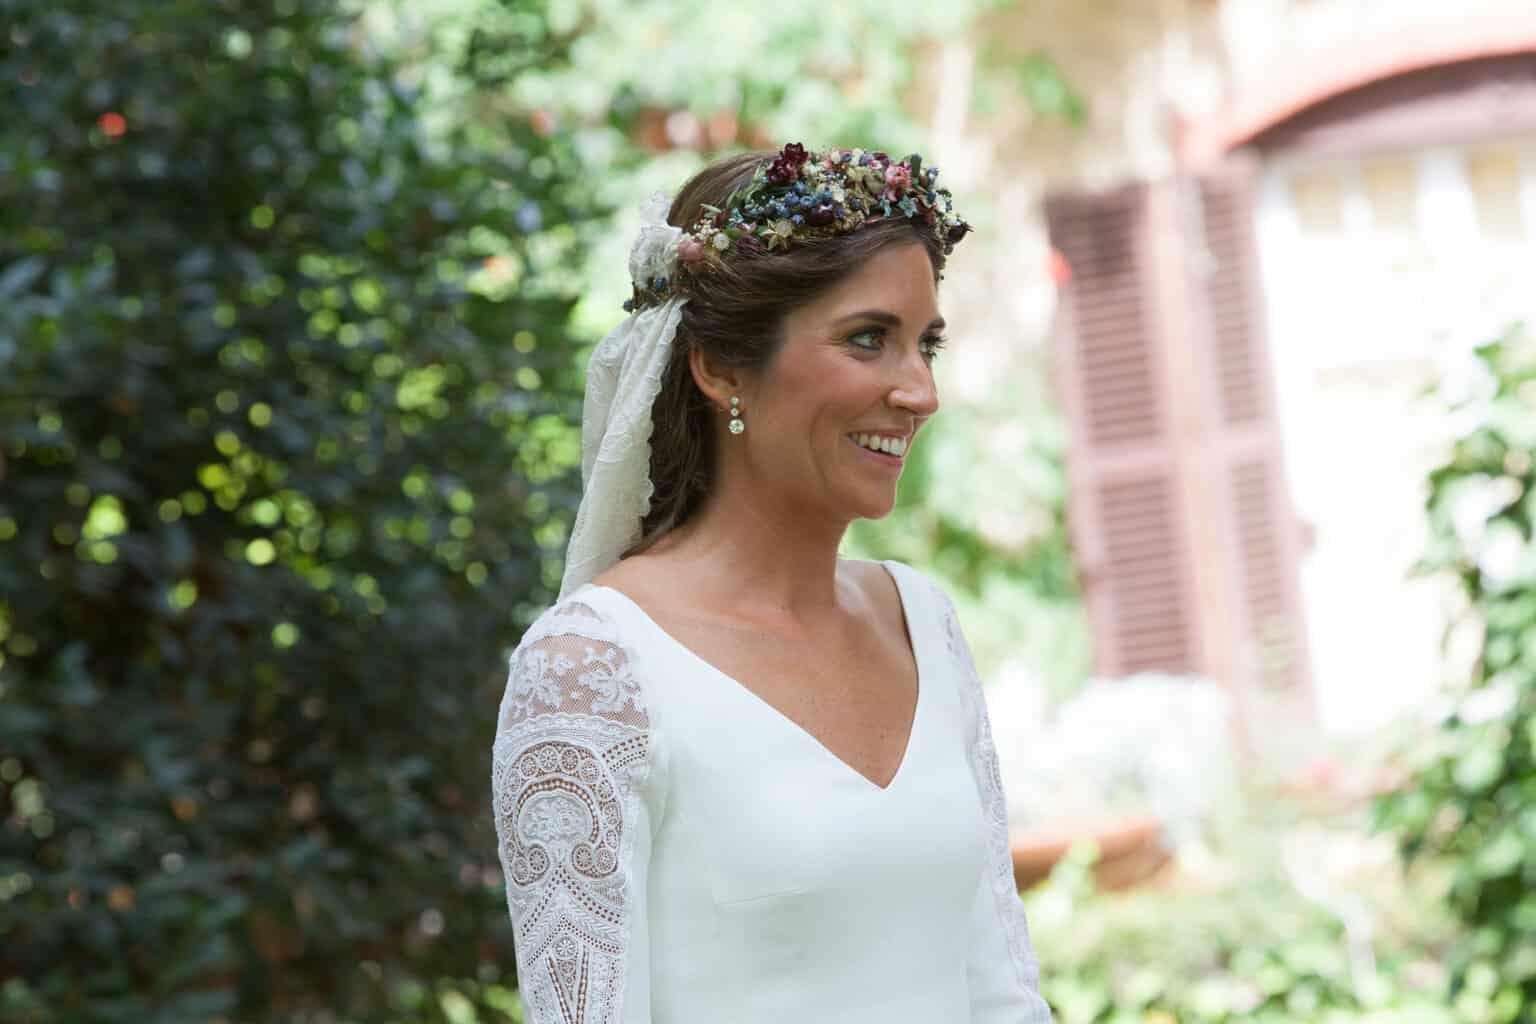 cd1f56a04 1254 - Las bodas de Tatín